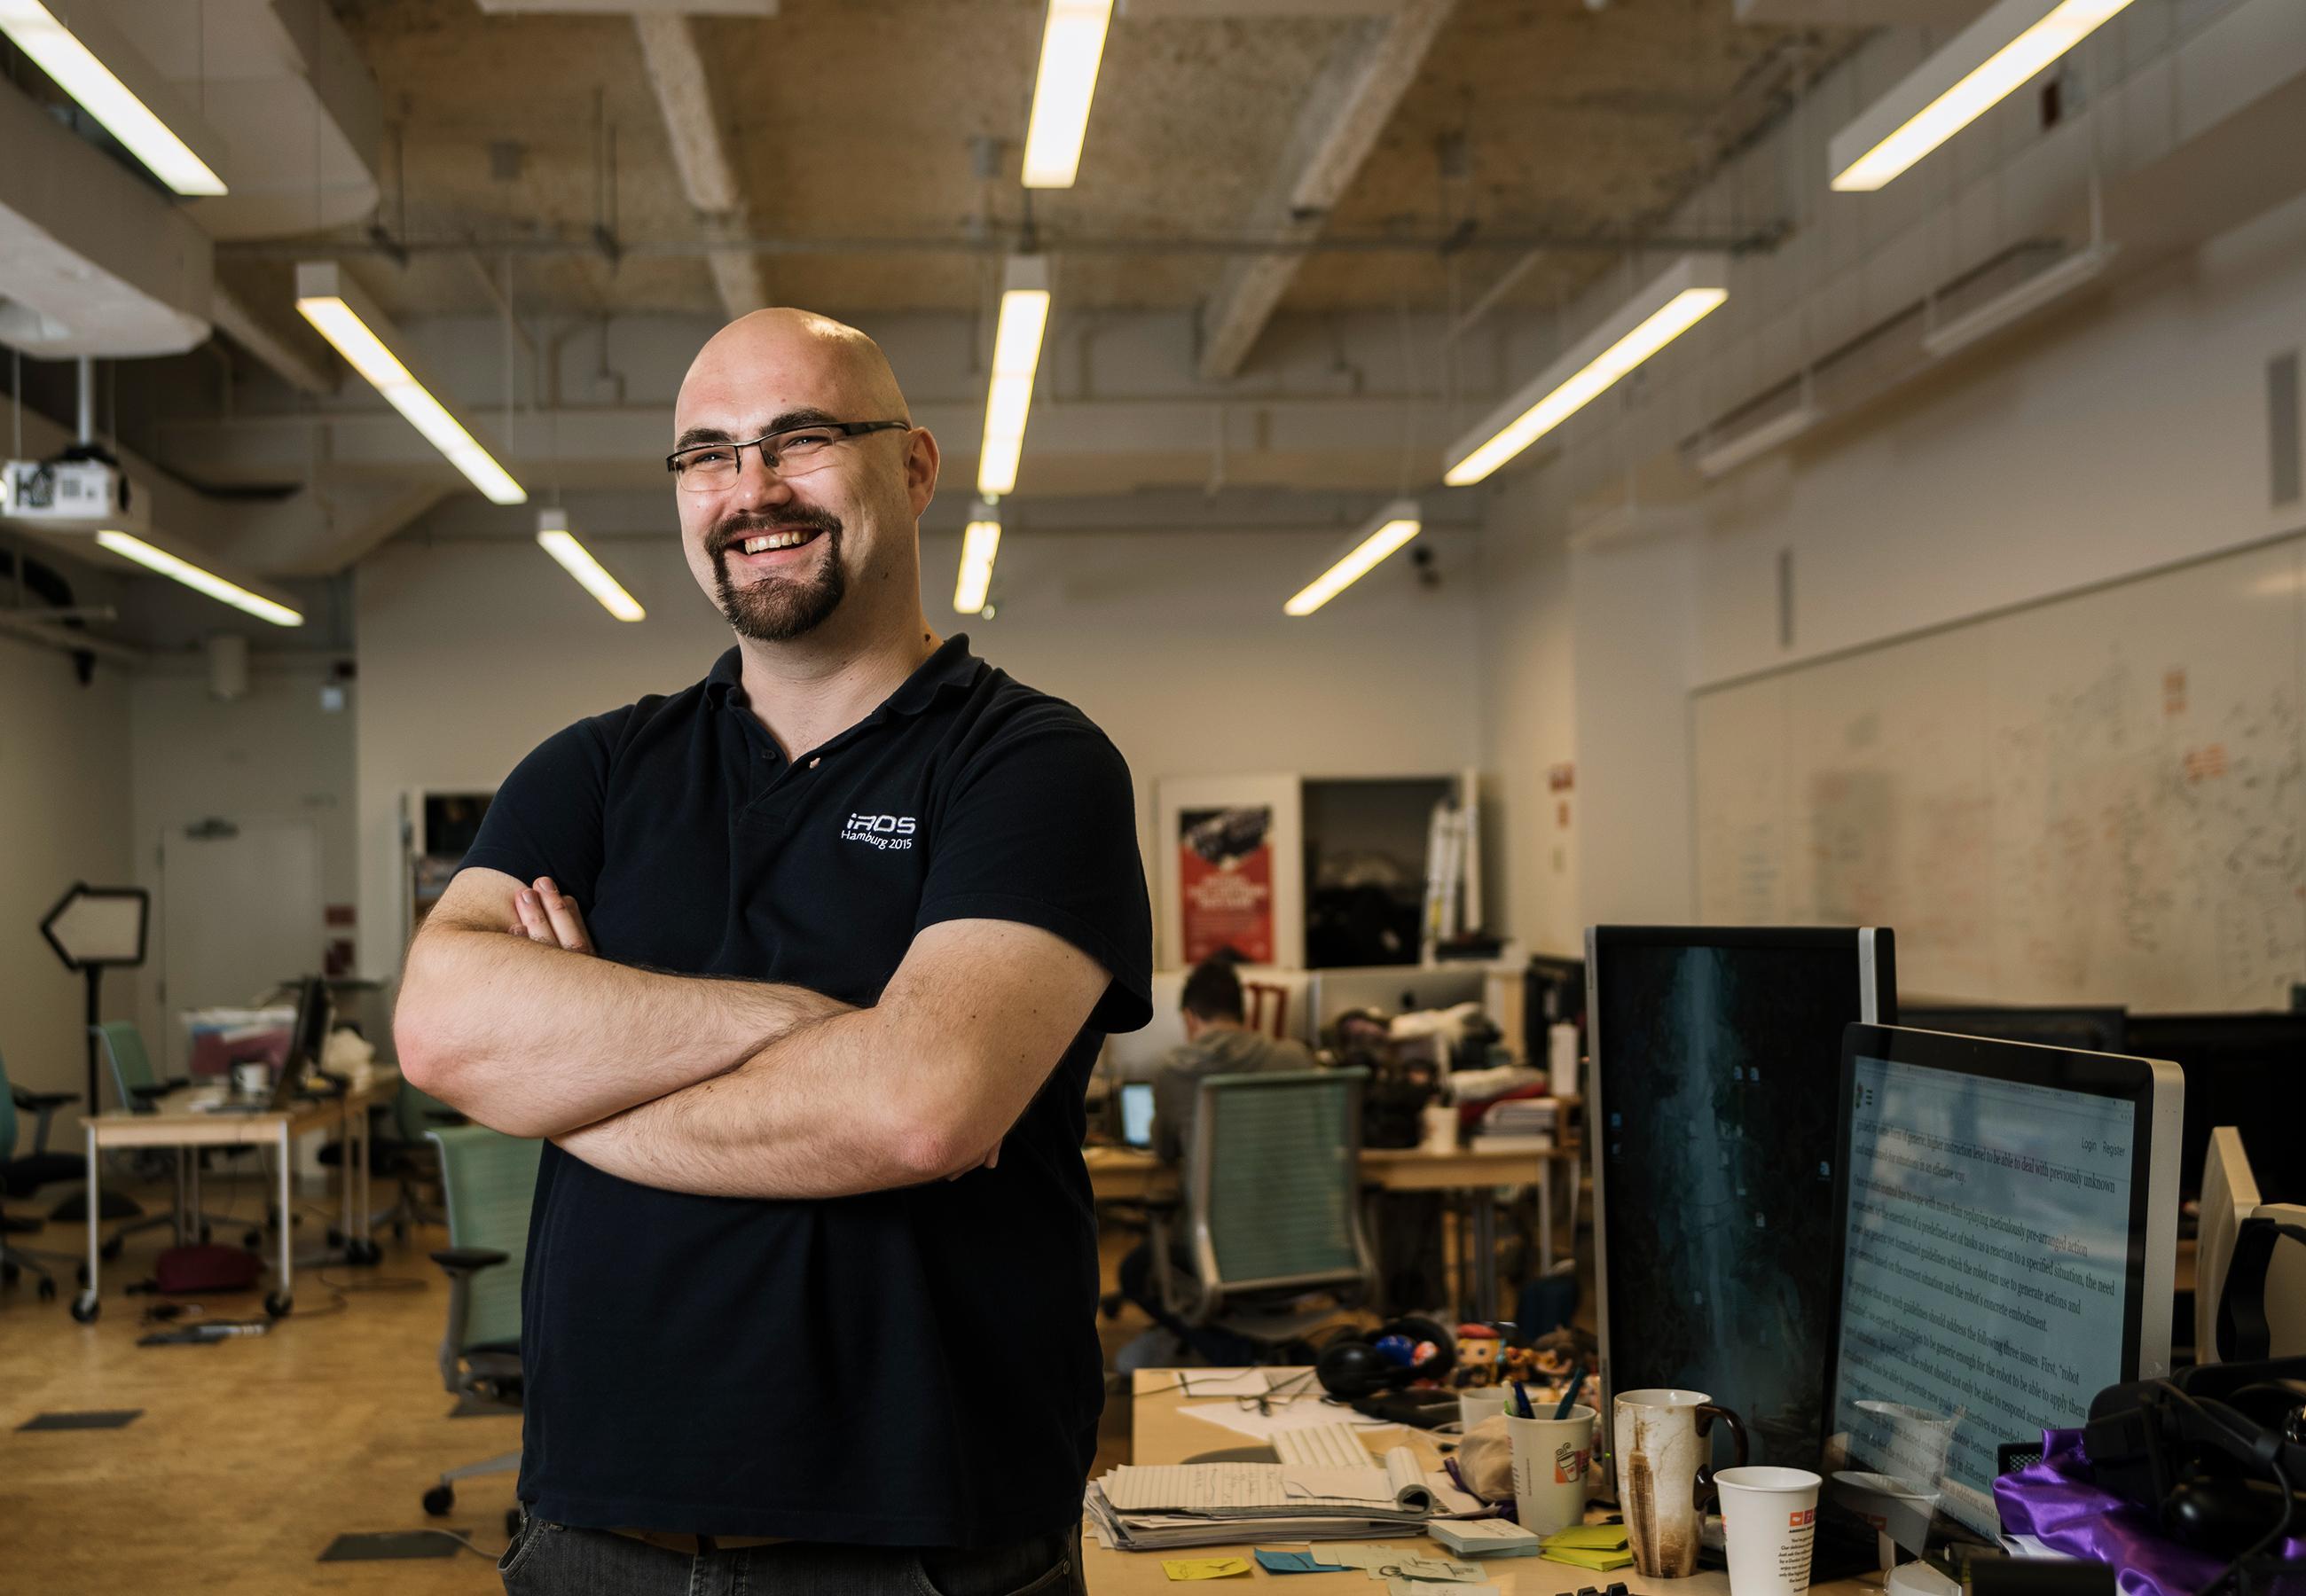 Christoph Salge at New York University's Game Innovation Lab.